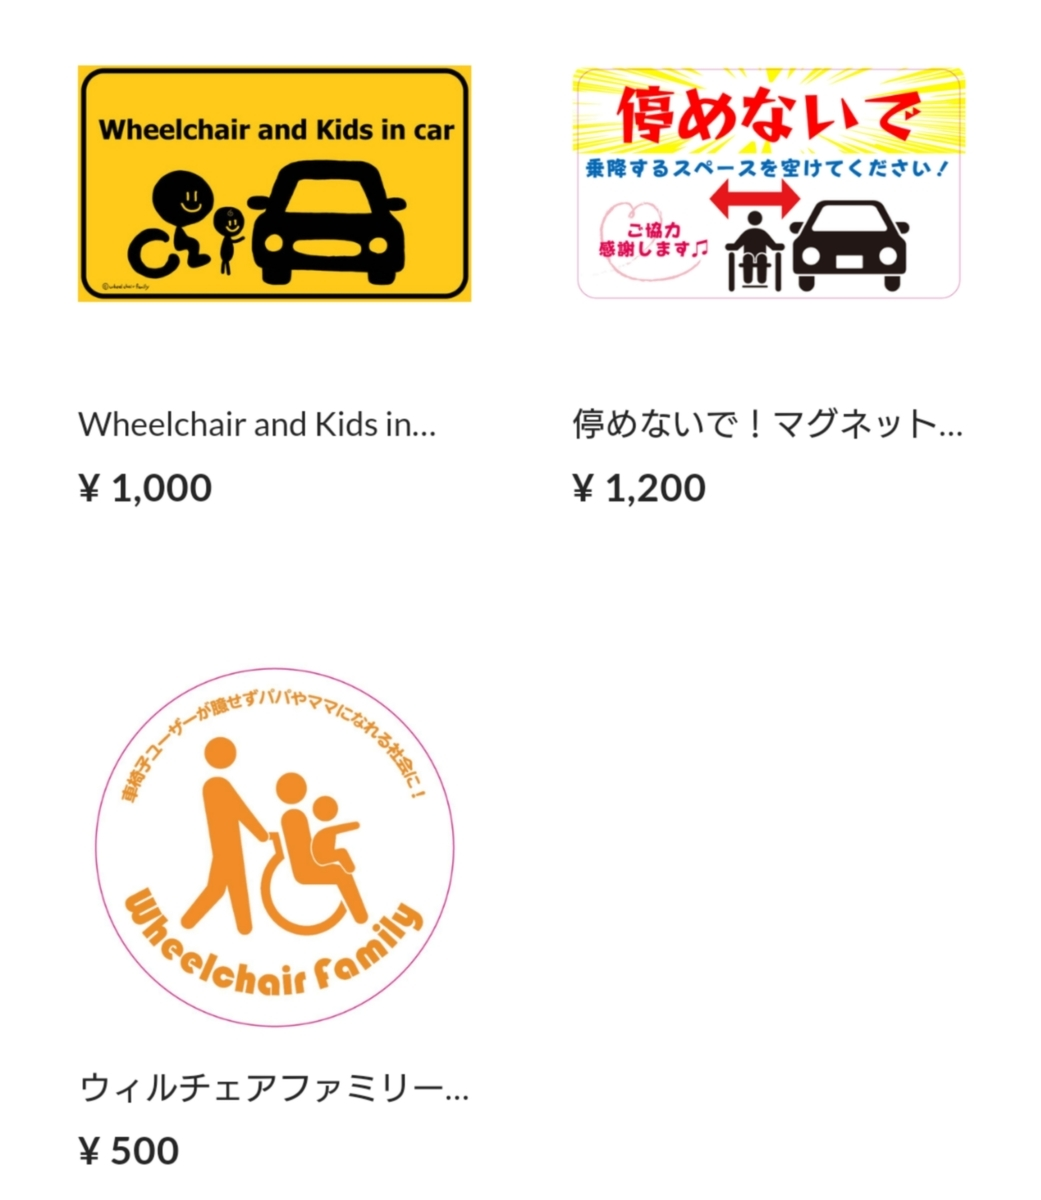 f:id:WheelchairFamily:20200222100451j:plain